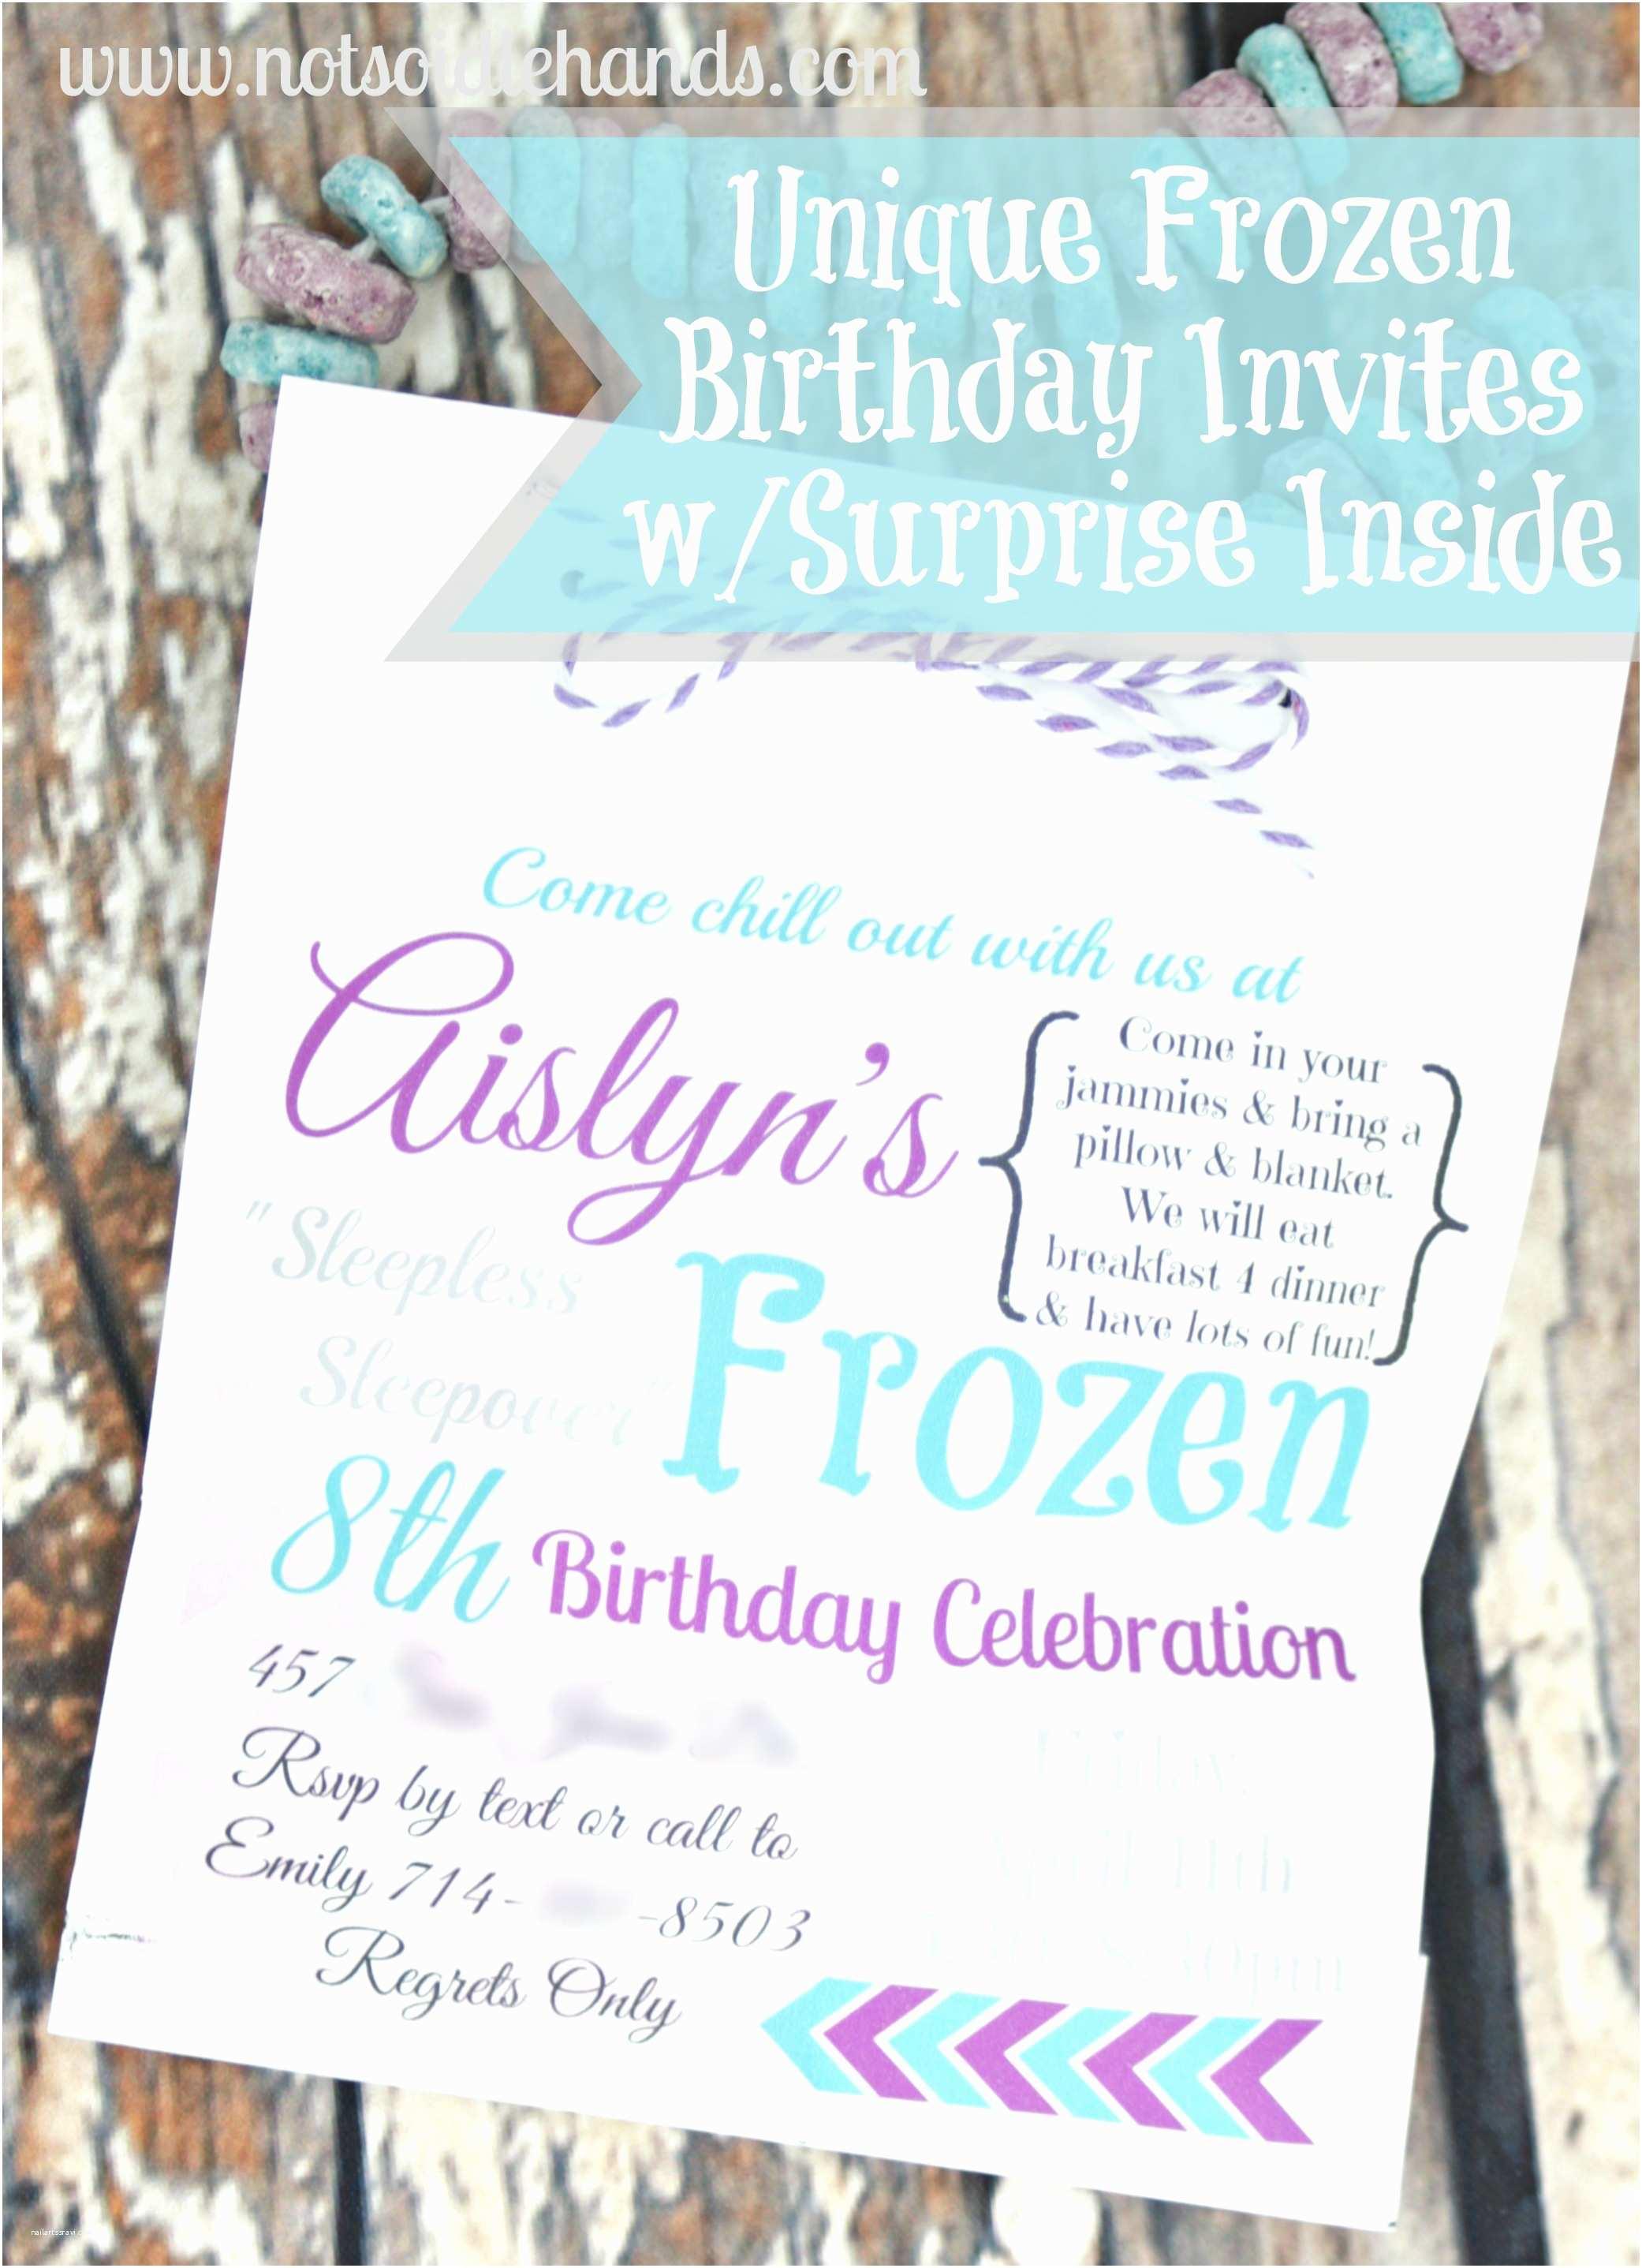 Frozen Birthday Party Invitations Unique Frozen Birthday Party Invites with Treat Inside